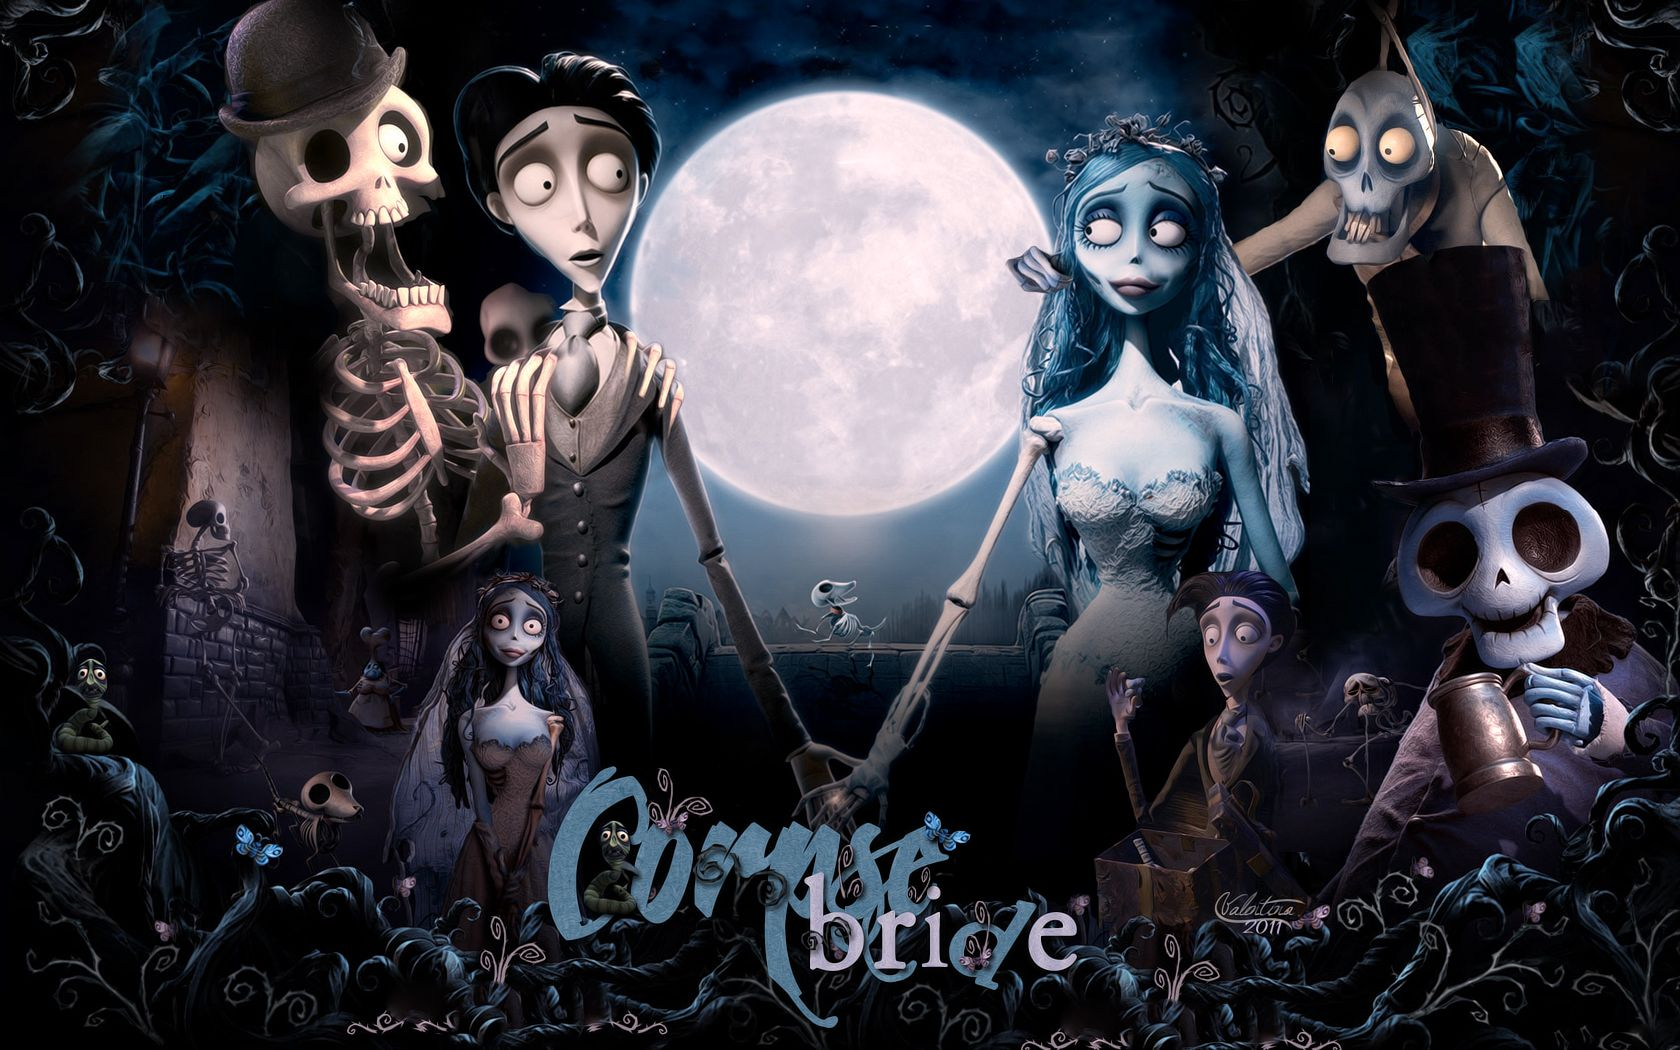 corpse bride | corpse bride - Halloween Wallpaper (26851795) - Fanpop fanclubs